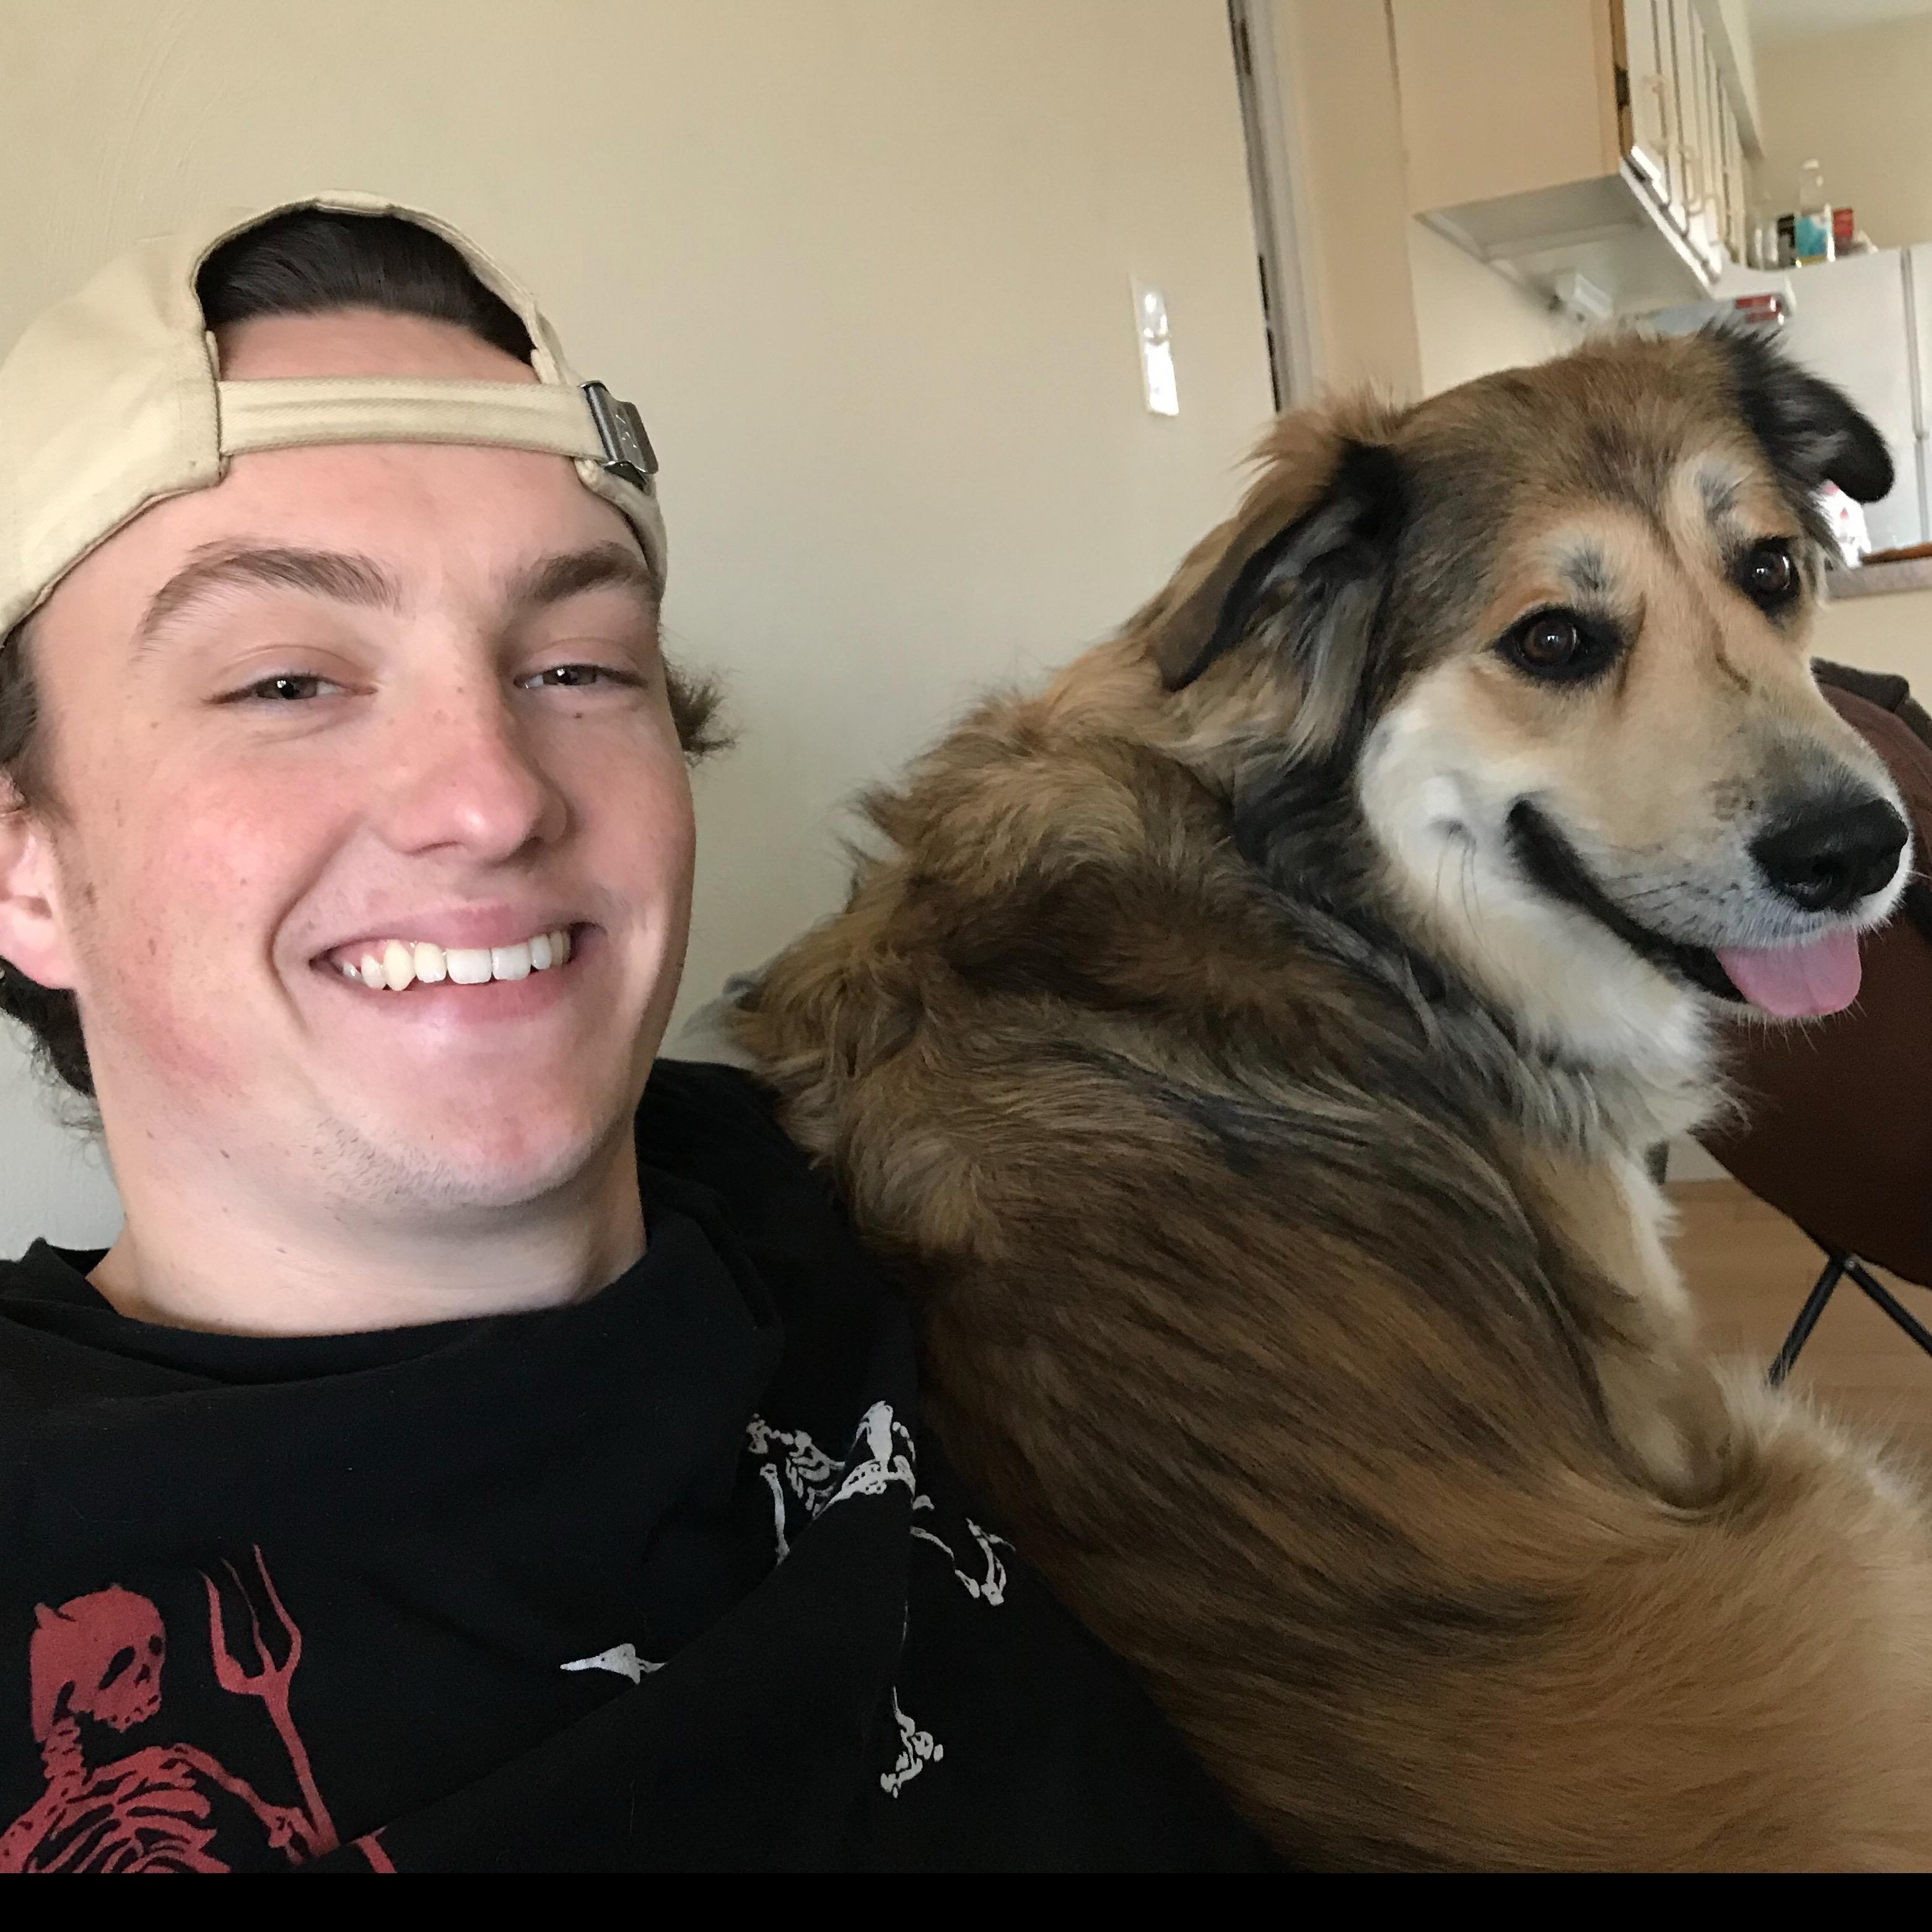 Scott's dog day care